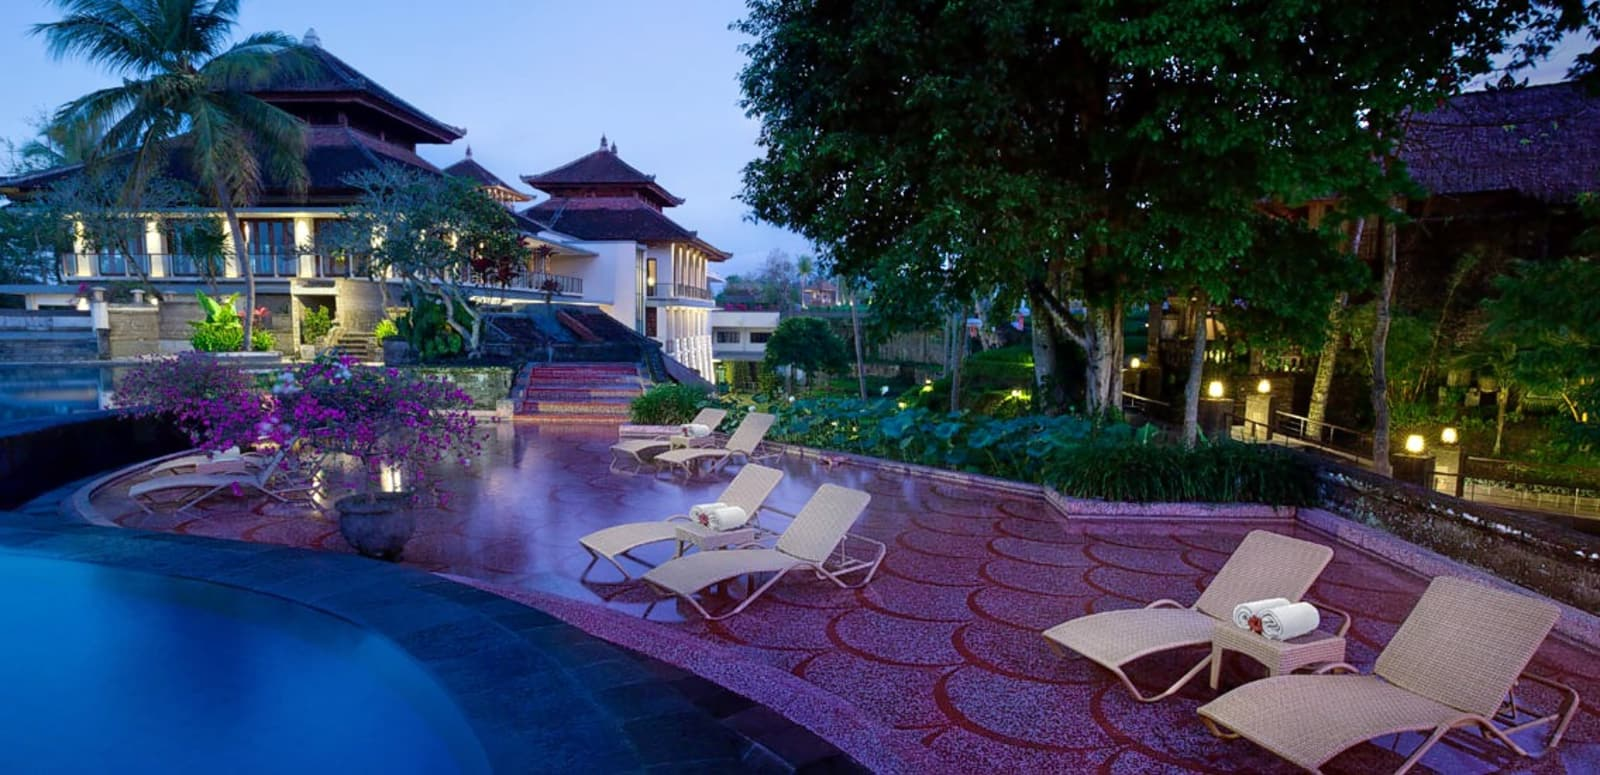 15 Best Luxury Secluded Getaways in Australia